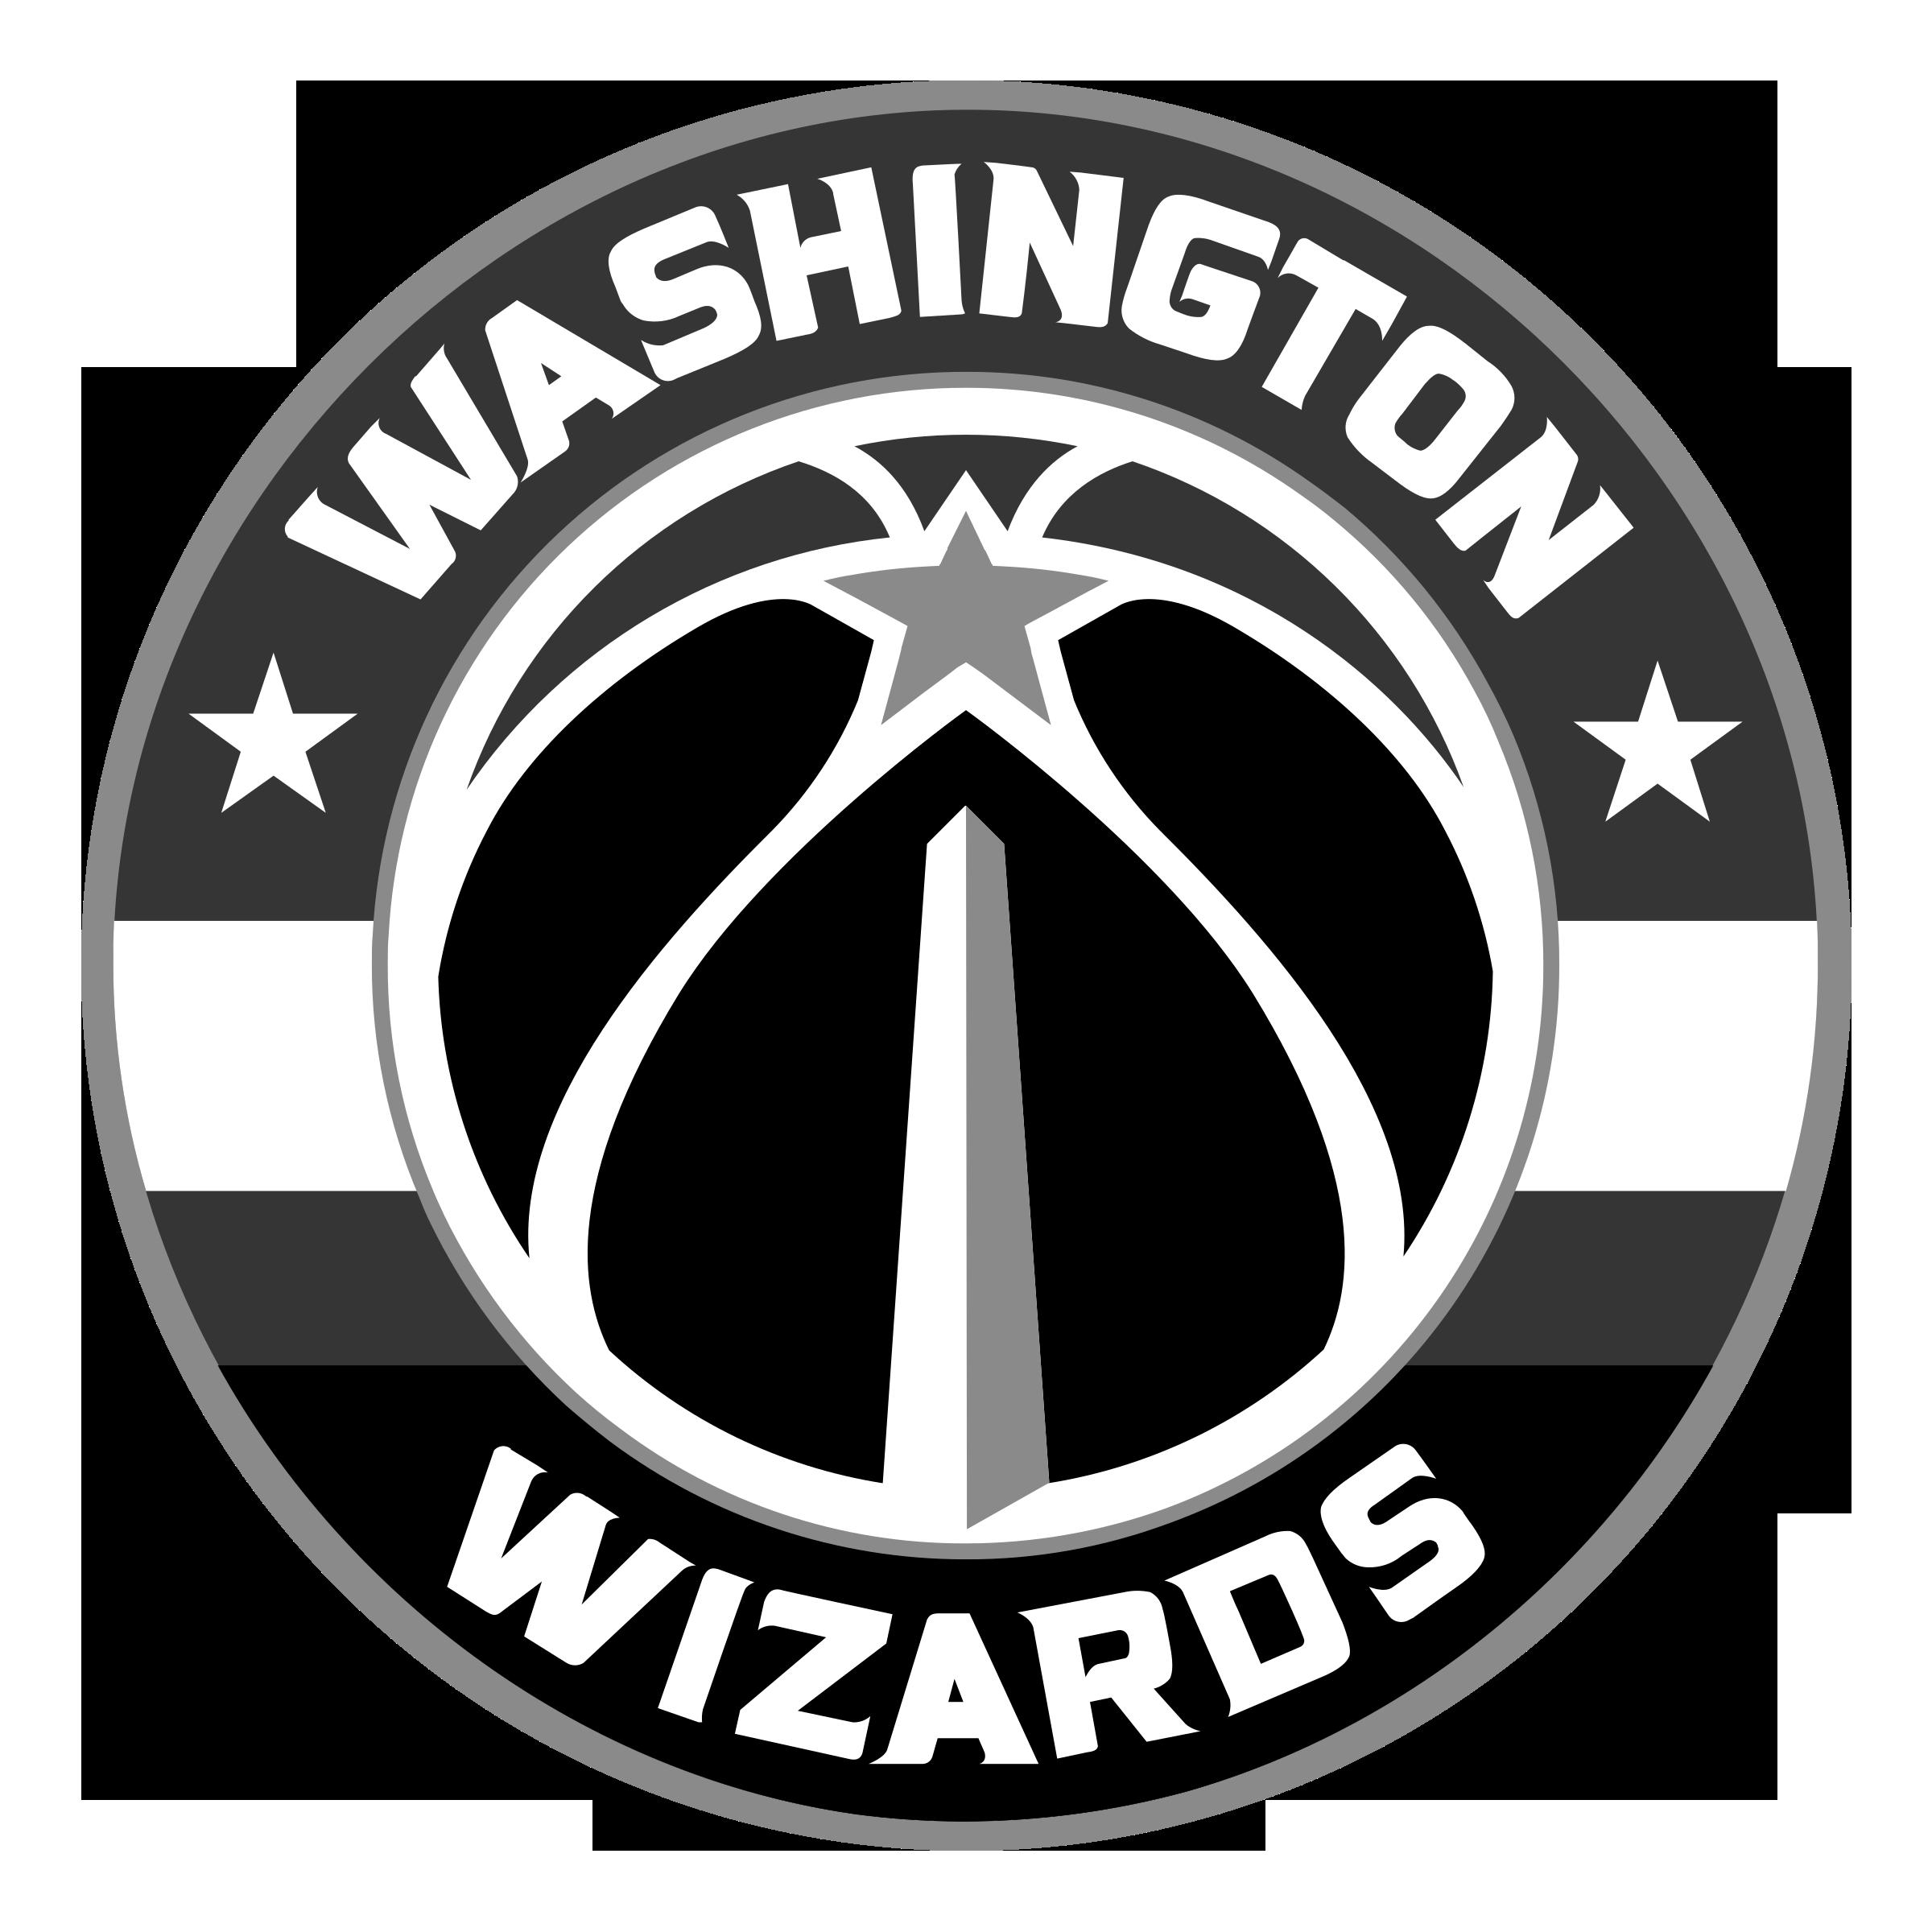 Washington Wizards Logo Png Transparent Svg Vector Freebie Supply